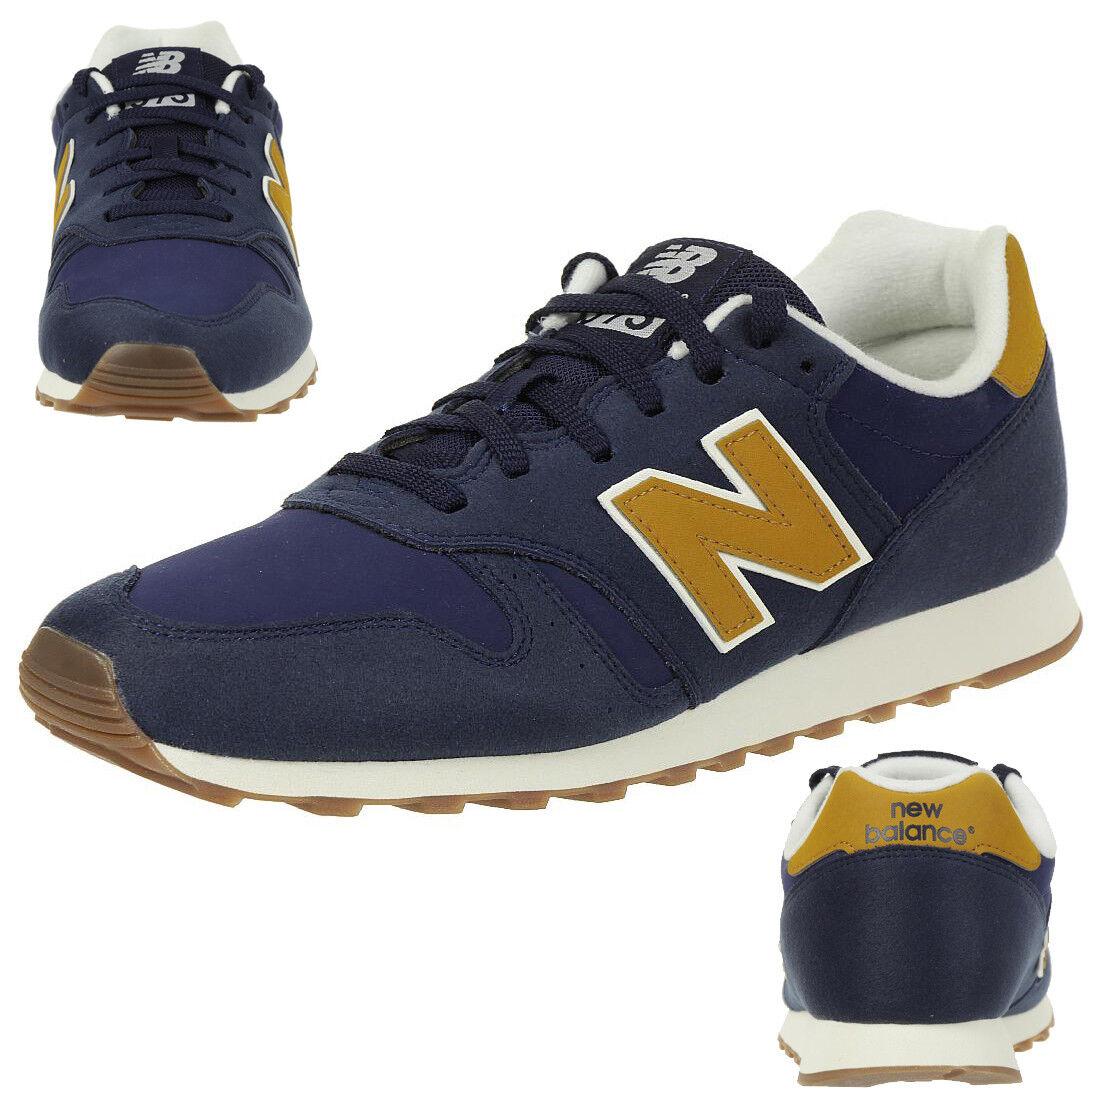 New Balance ML373KGS Blau Classic Sneaker Unisex Schuhe Blau ML373KGS 4707db